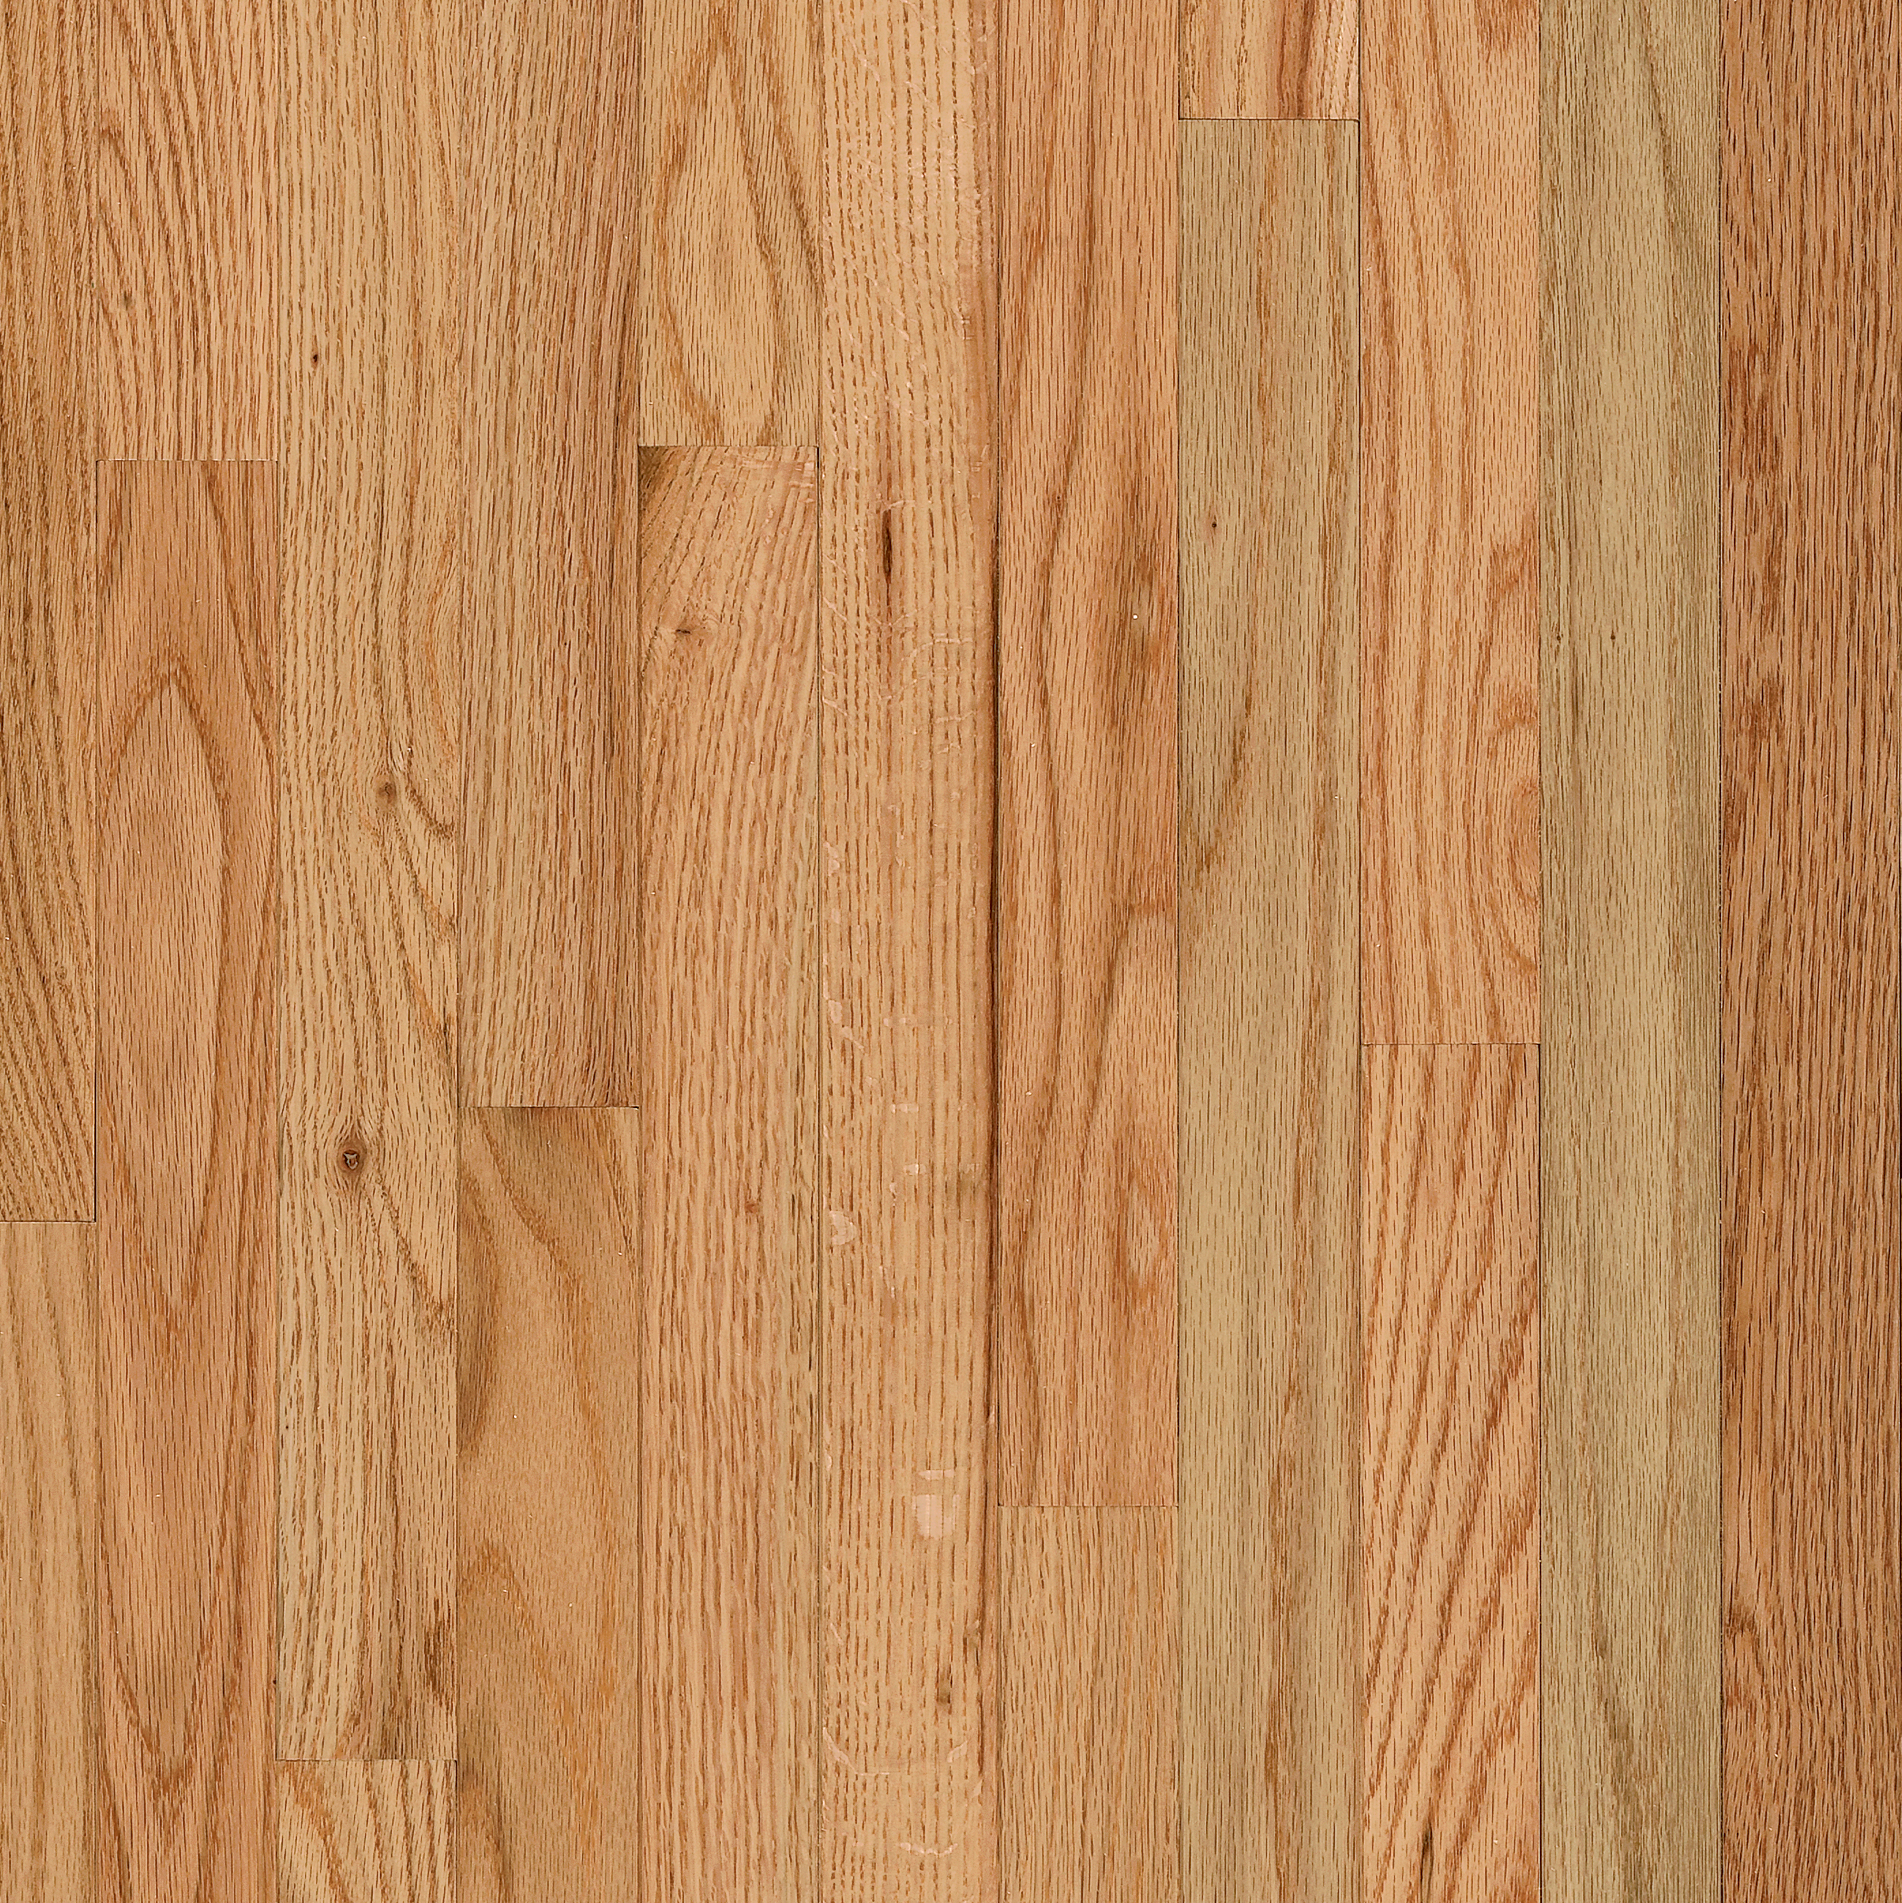 Solid Hardwood Laurel Strip Cb921 Bruce